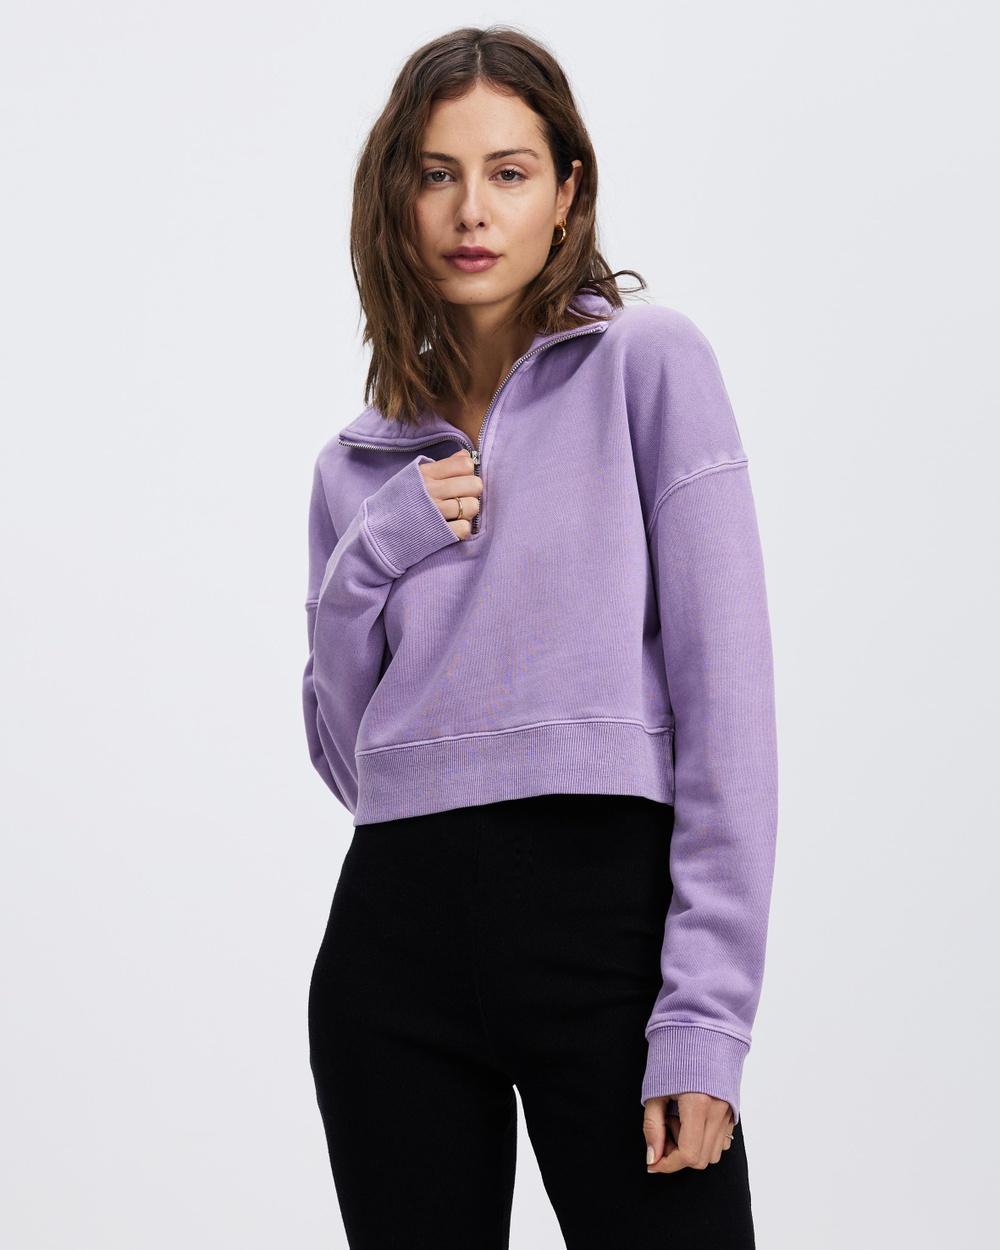 AERE Organic Cotton Cropped Quarter Zip Sweats Purple Amethyst